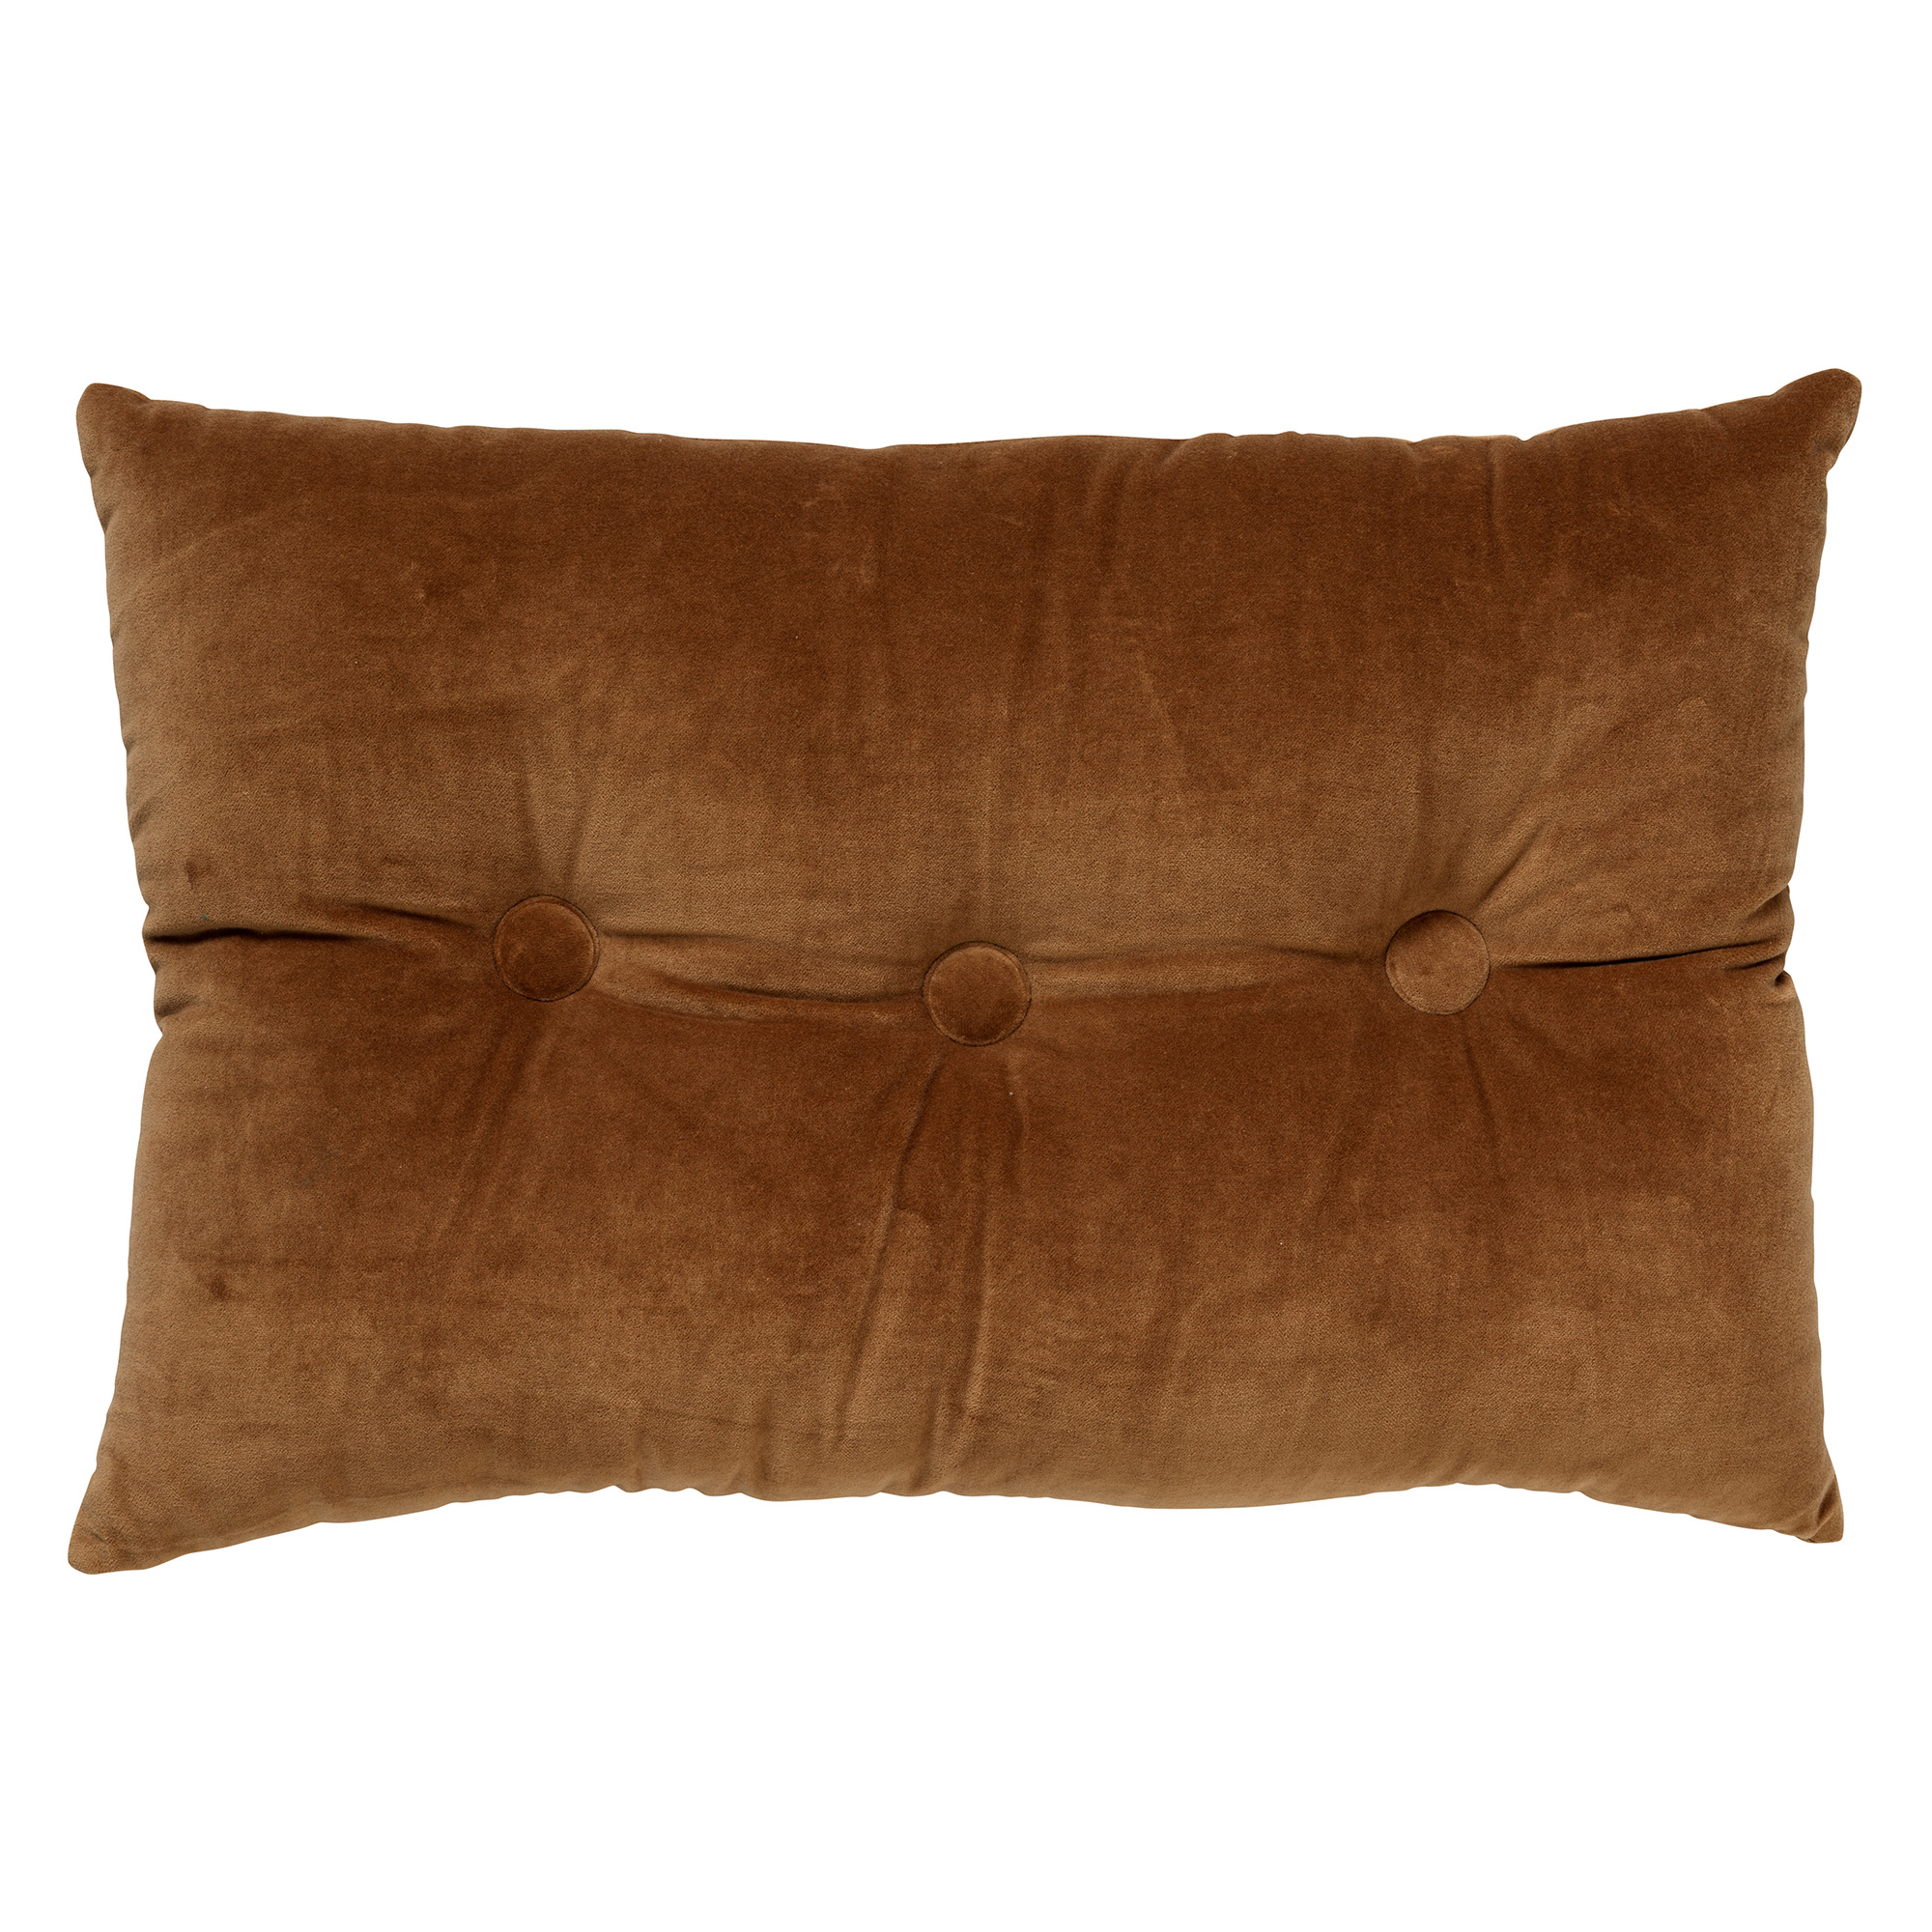 VALERIE - Sierkussen velvet Tobacco Brown 40x60 cm